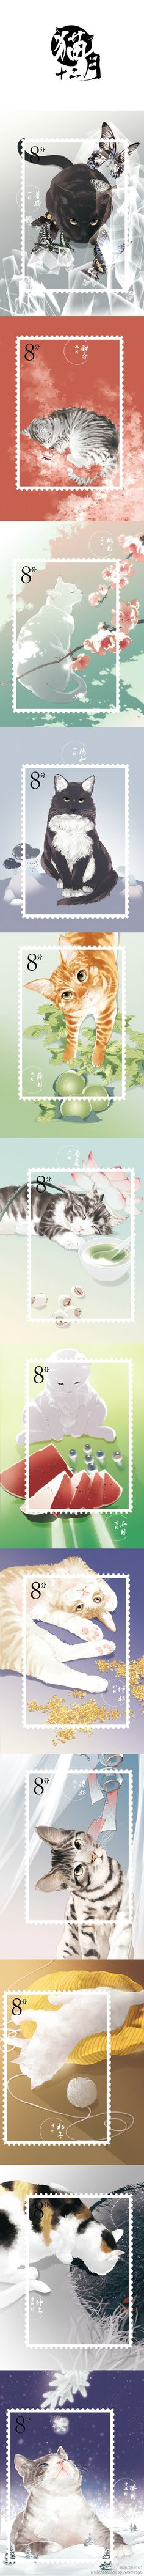 猫十二月 by 普 on Weibo